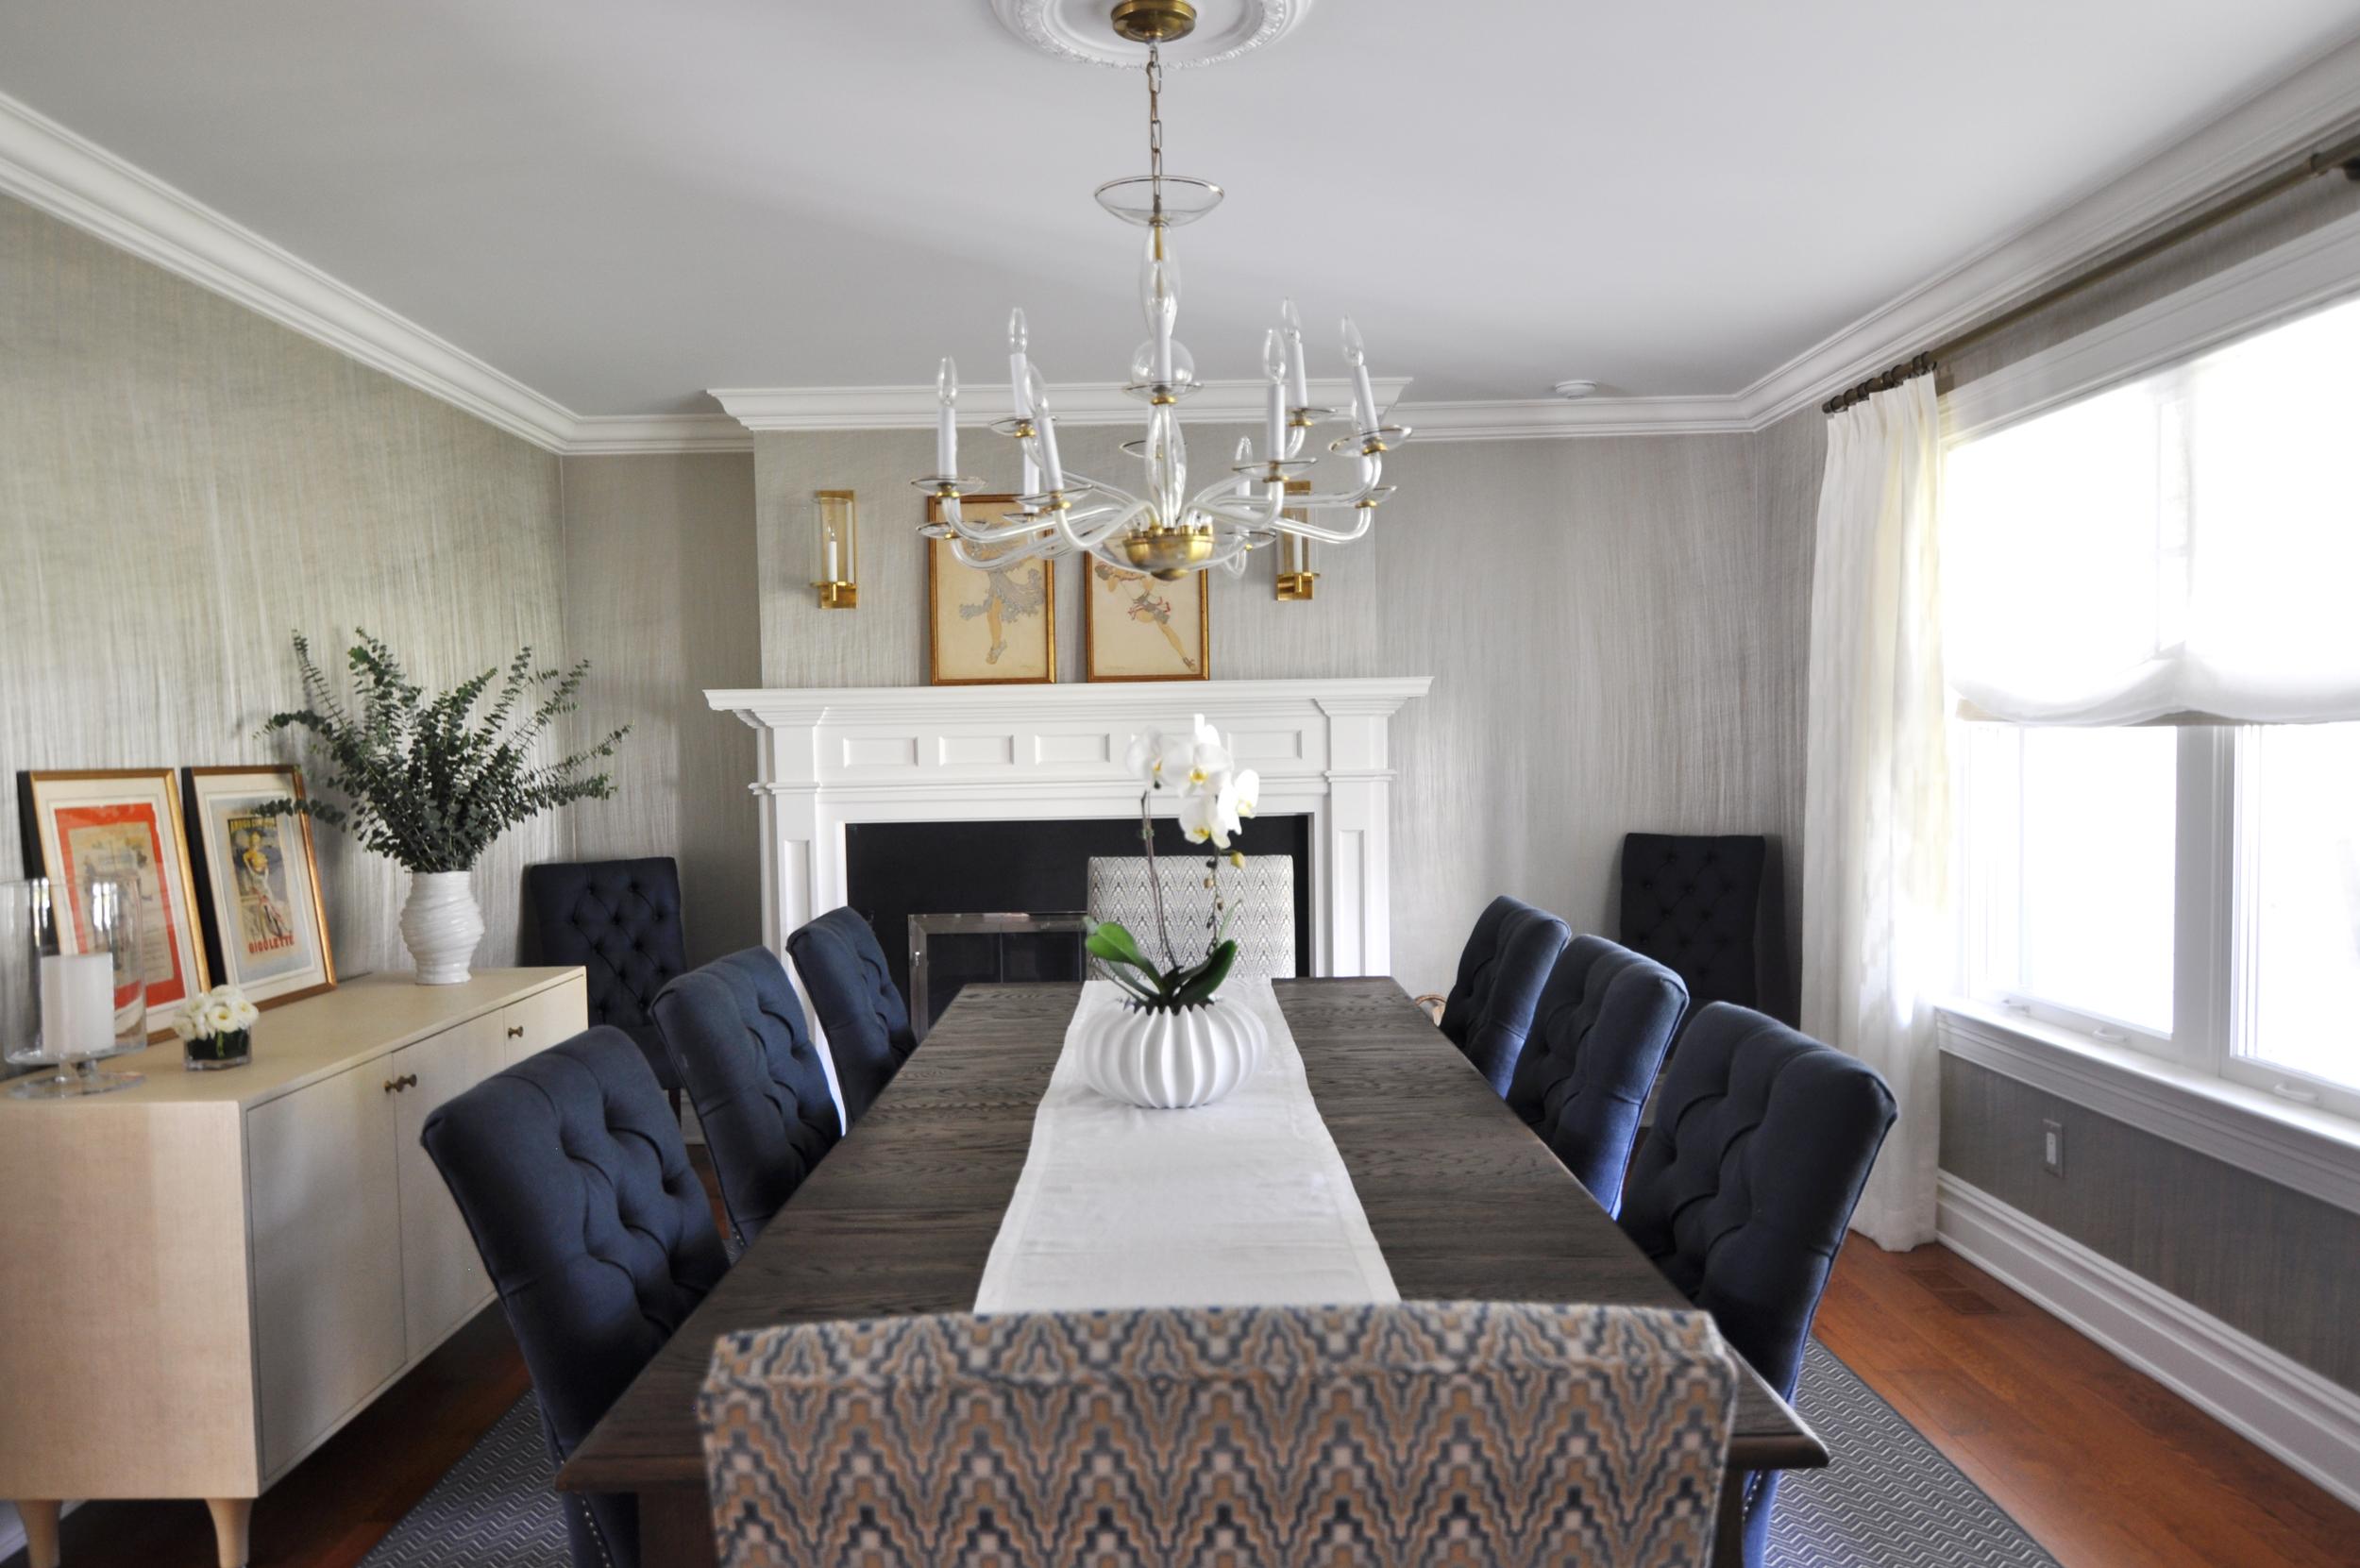 KAM DESIGN_Interior Designer Kim A Mitchell_Timeless Formal Dining Room_Made Goods Buffet_Kravet Host Chair Fabric_Circa Aerin Brass Sconces_2016 for Web.jpg